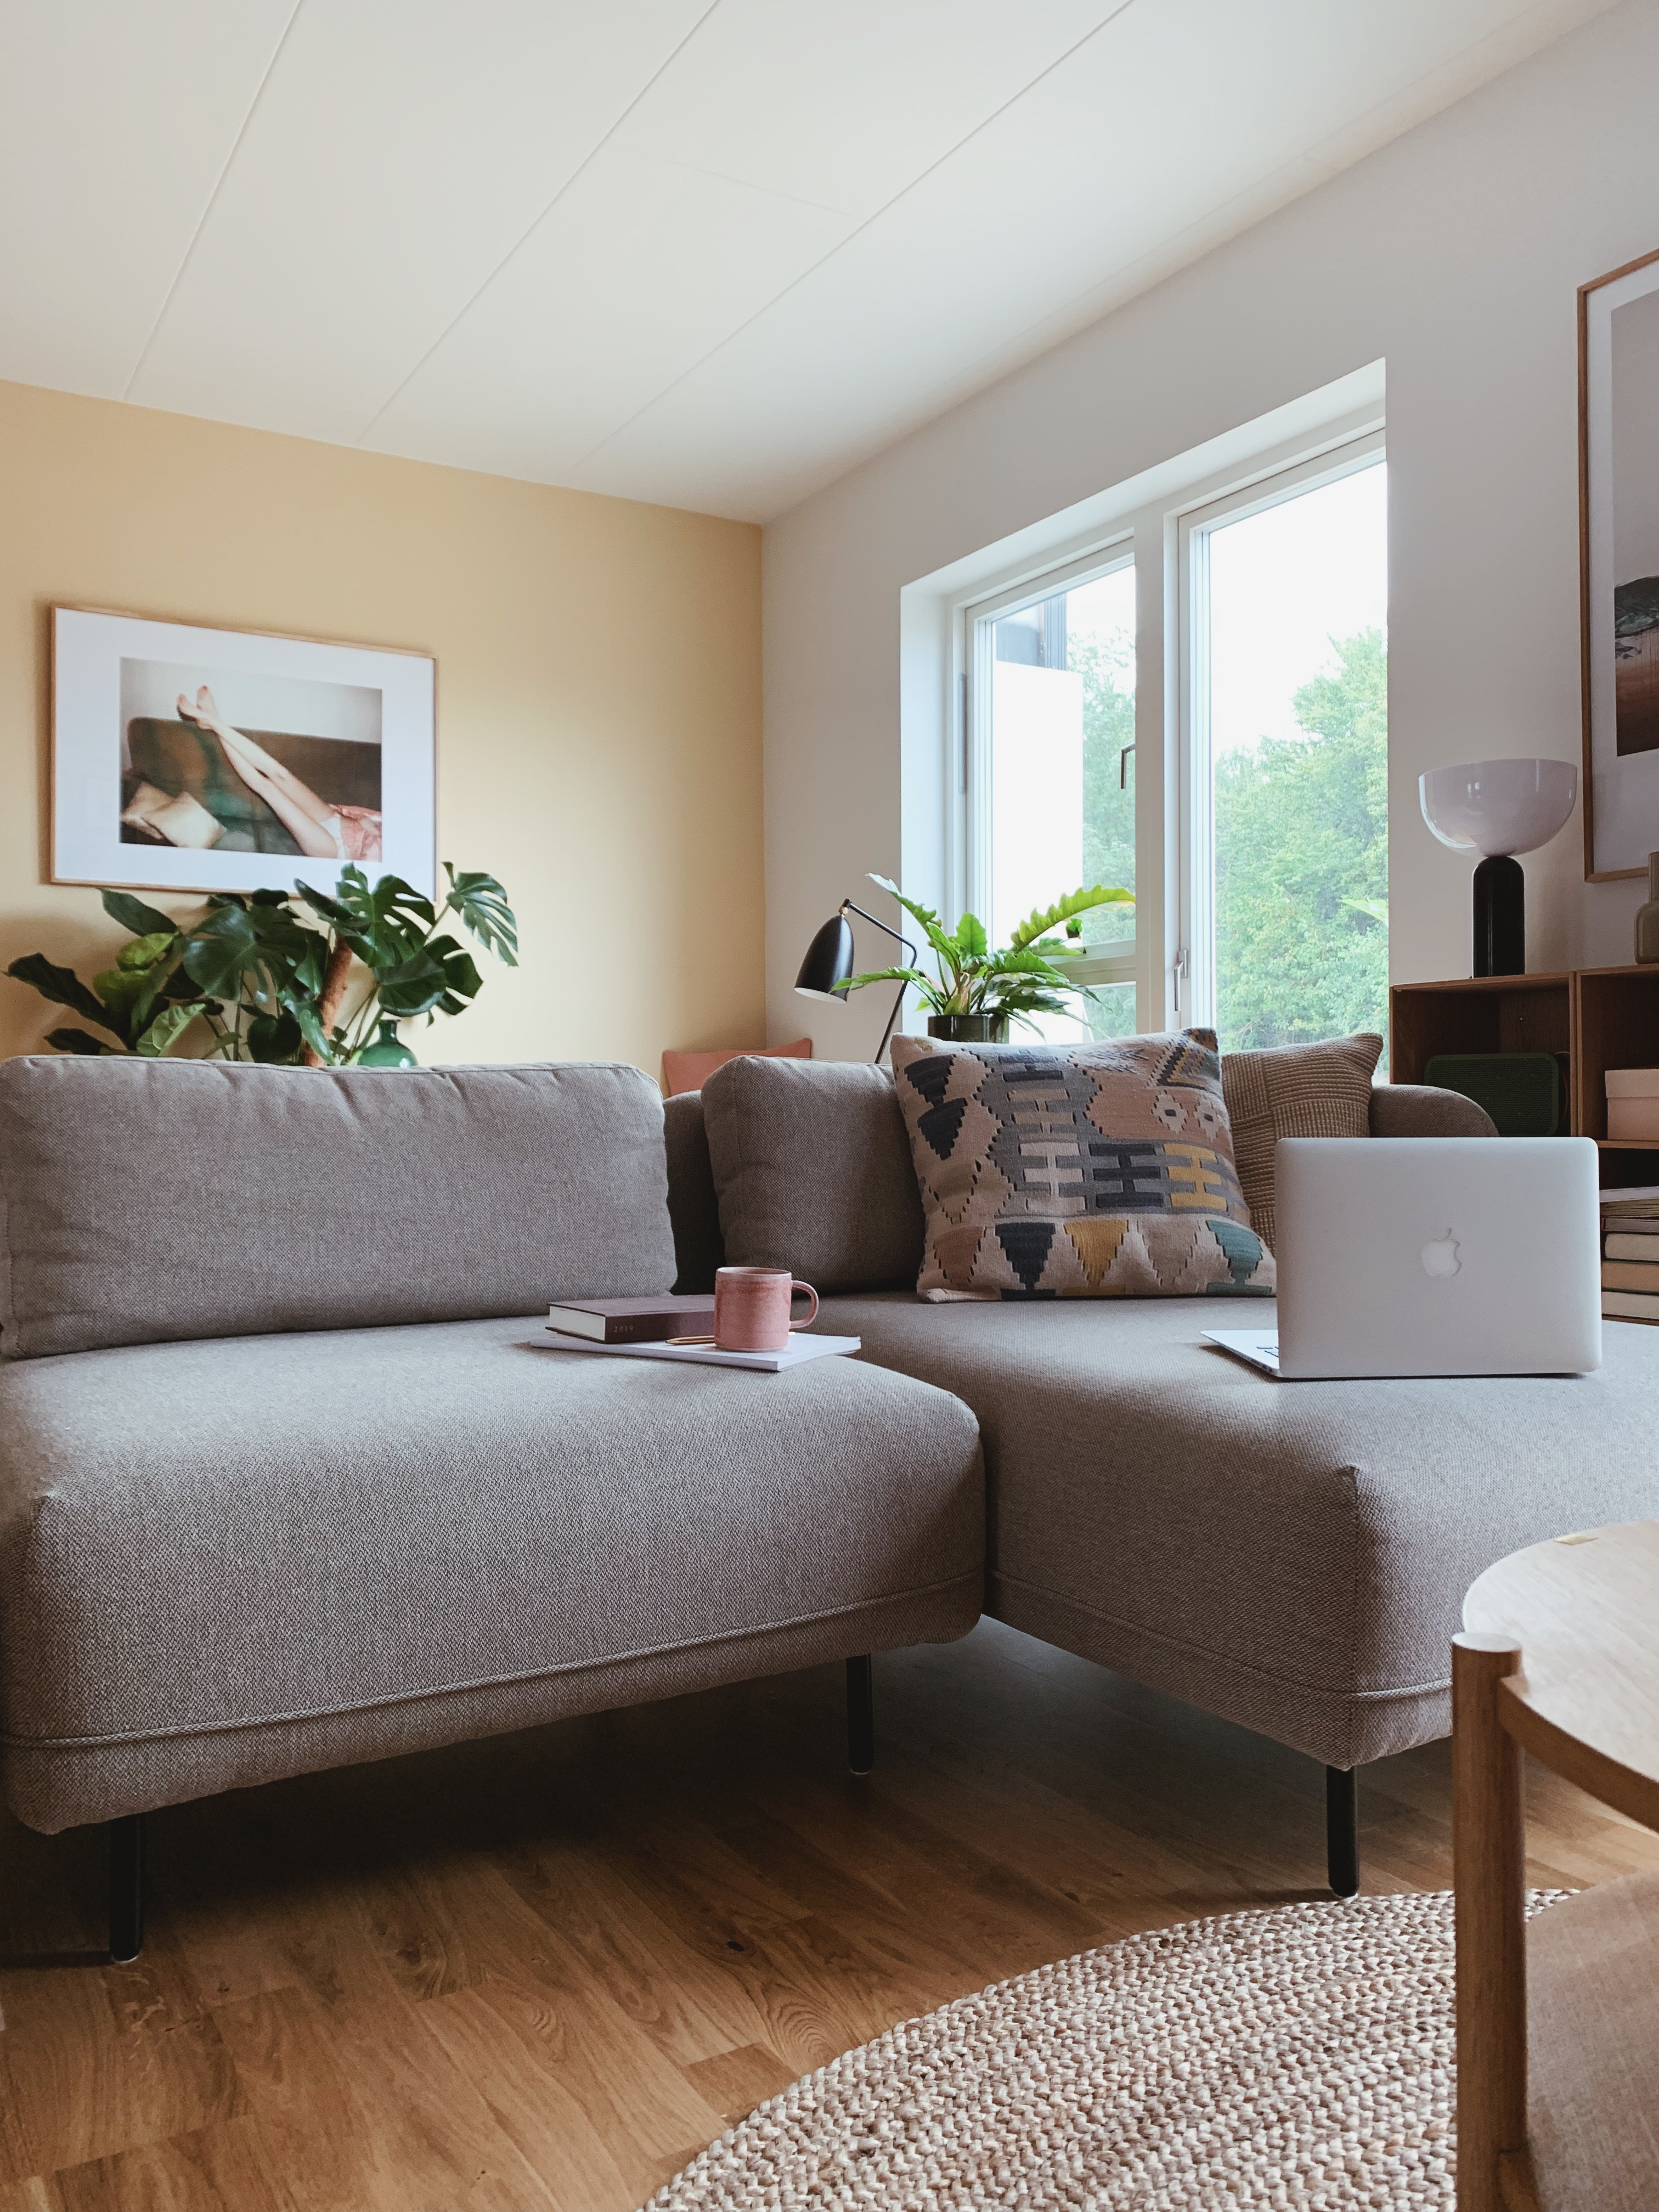 Chaiselong sofa